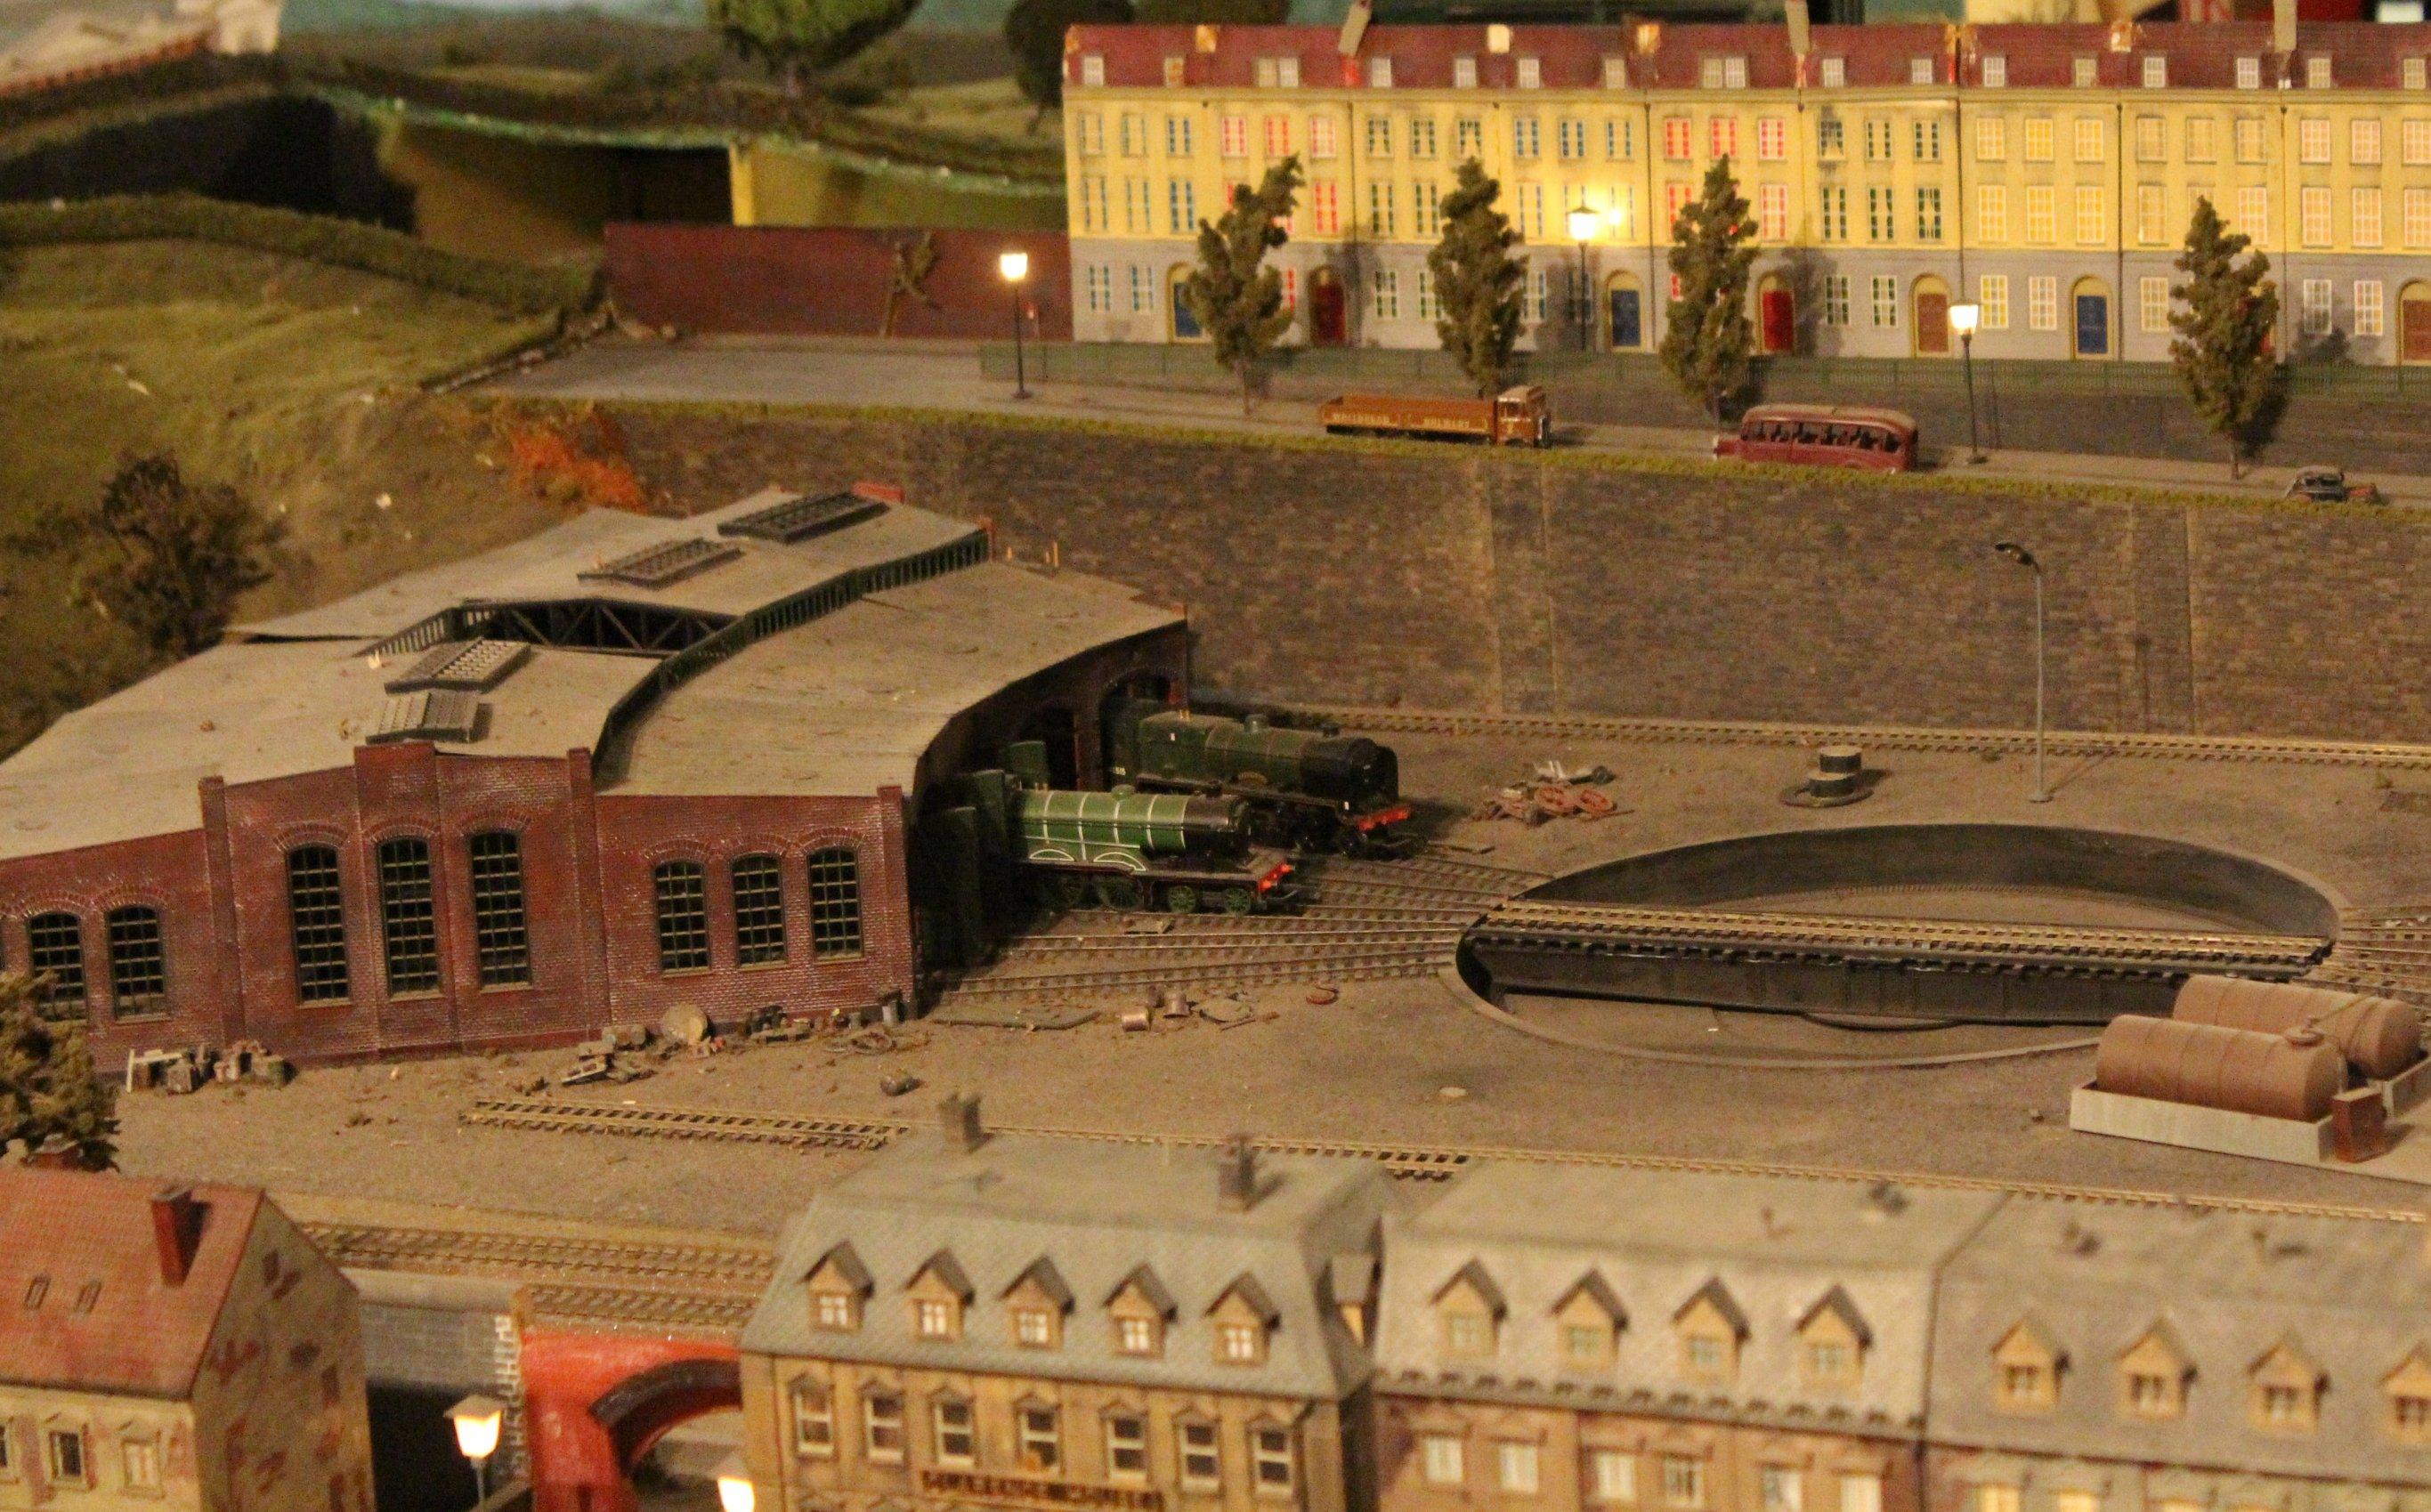 Trago Mills 00 Scale Model Railway 2013 32 Engine Shed